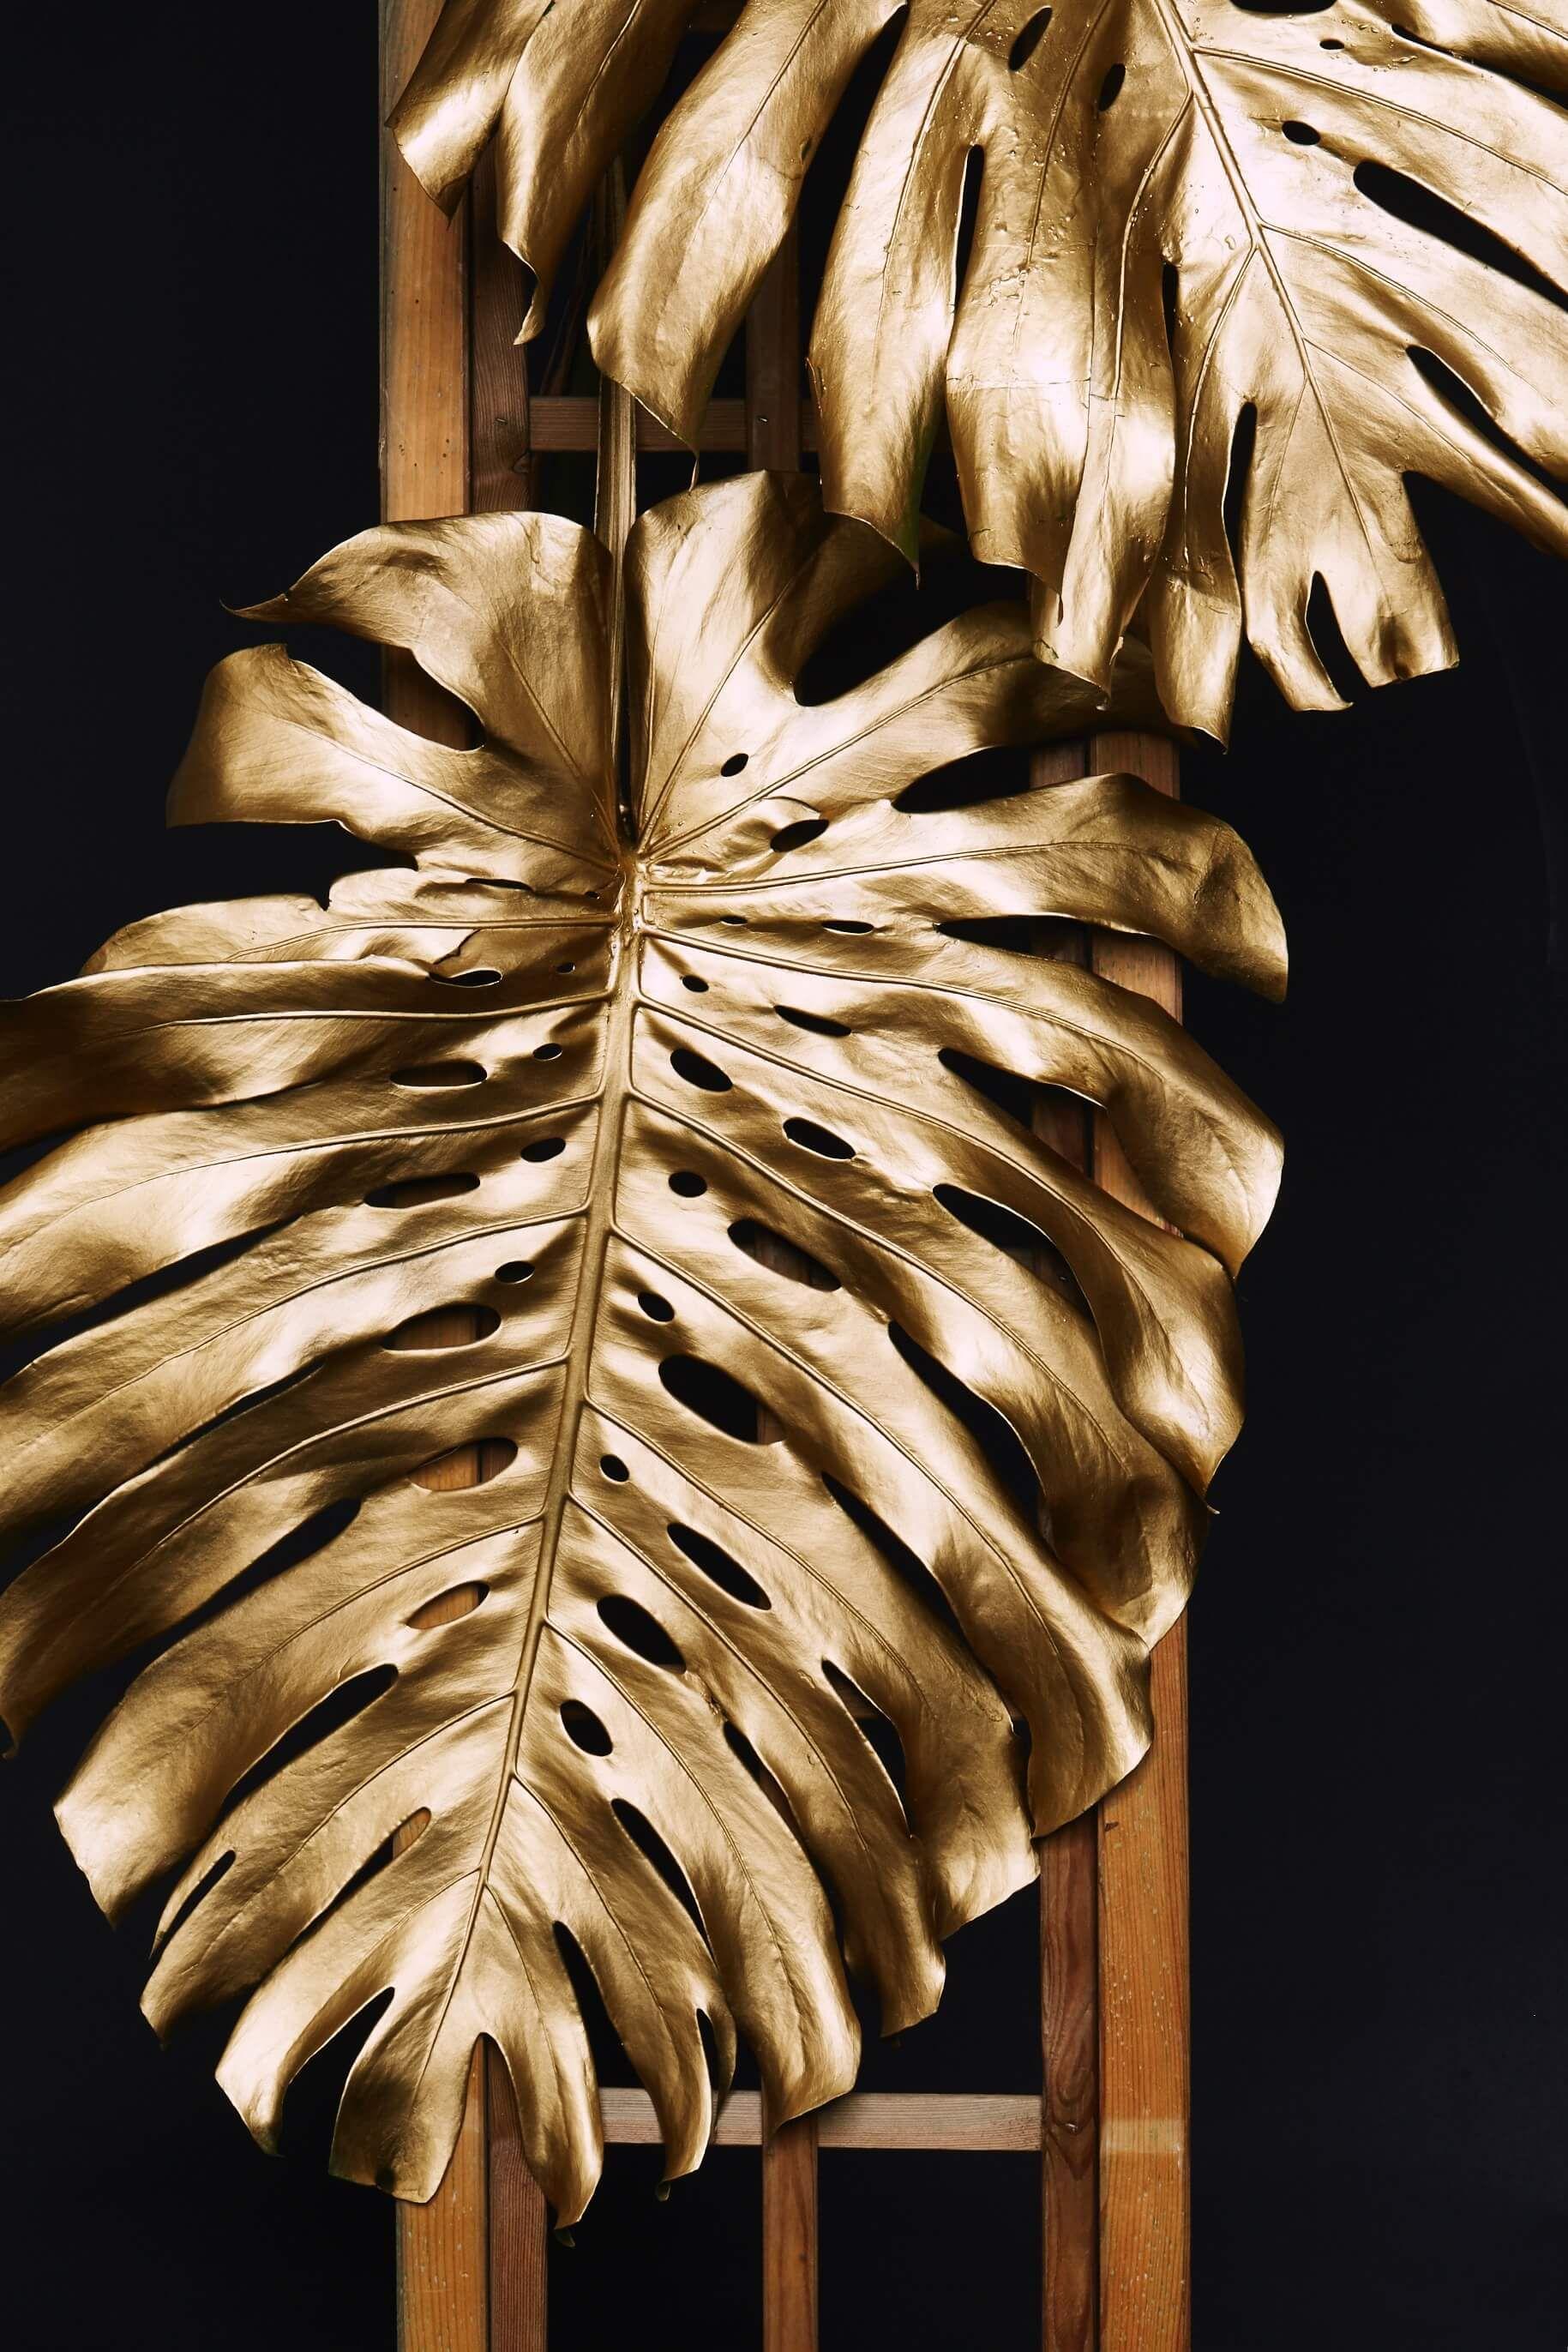 Golden Leaf Framed Print in 2020 Black, gold aesthetic